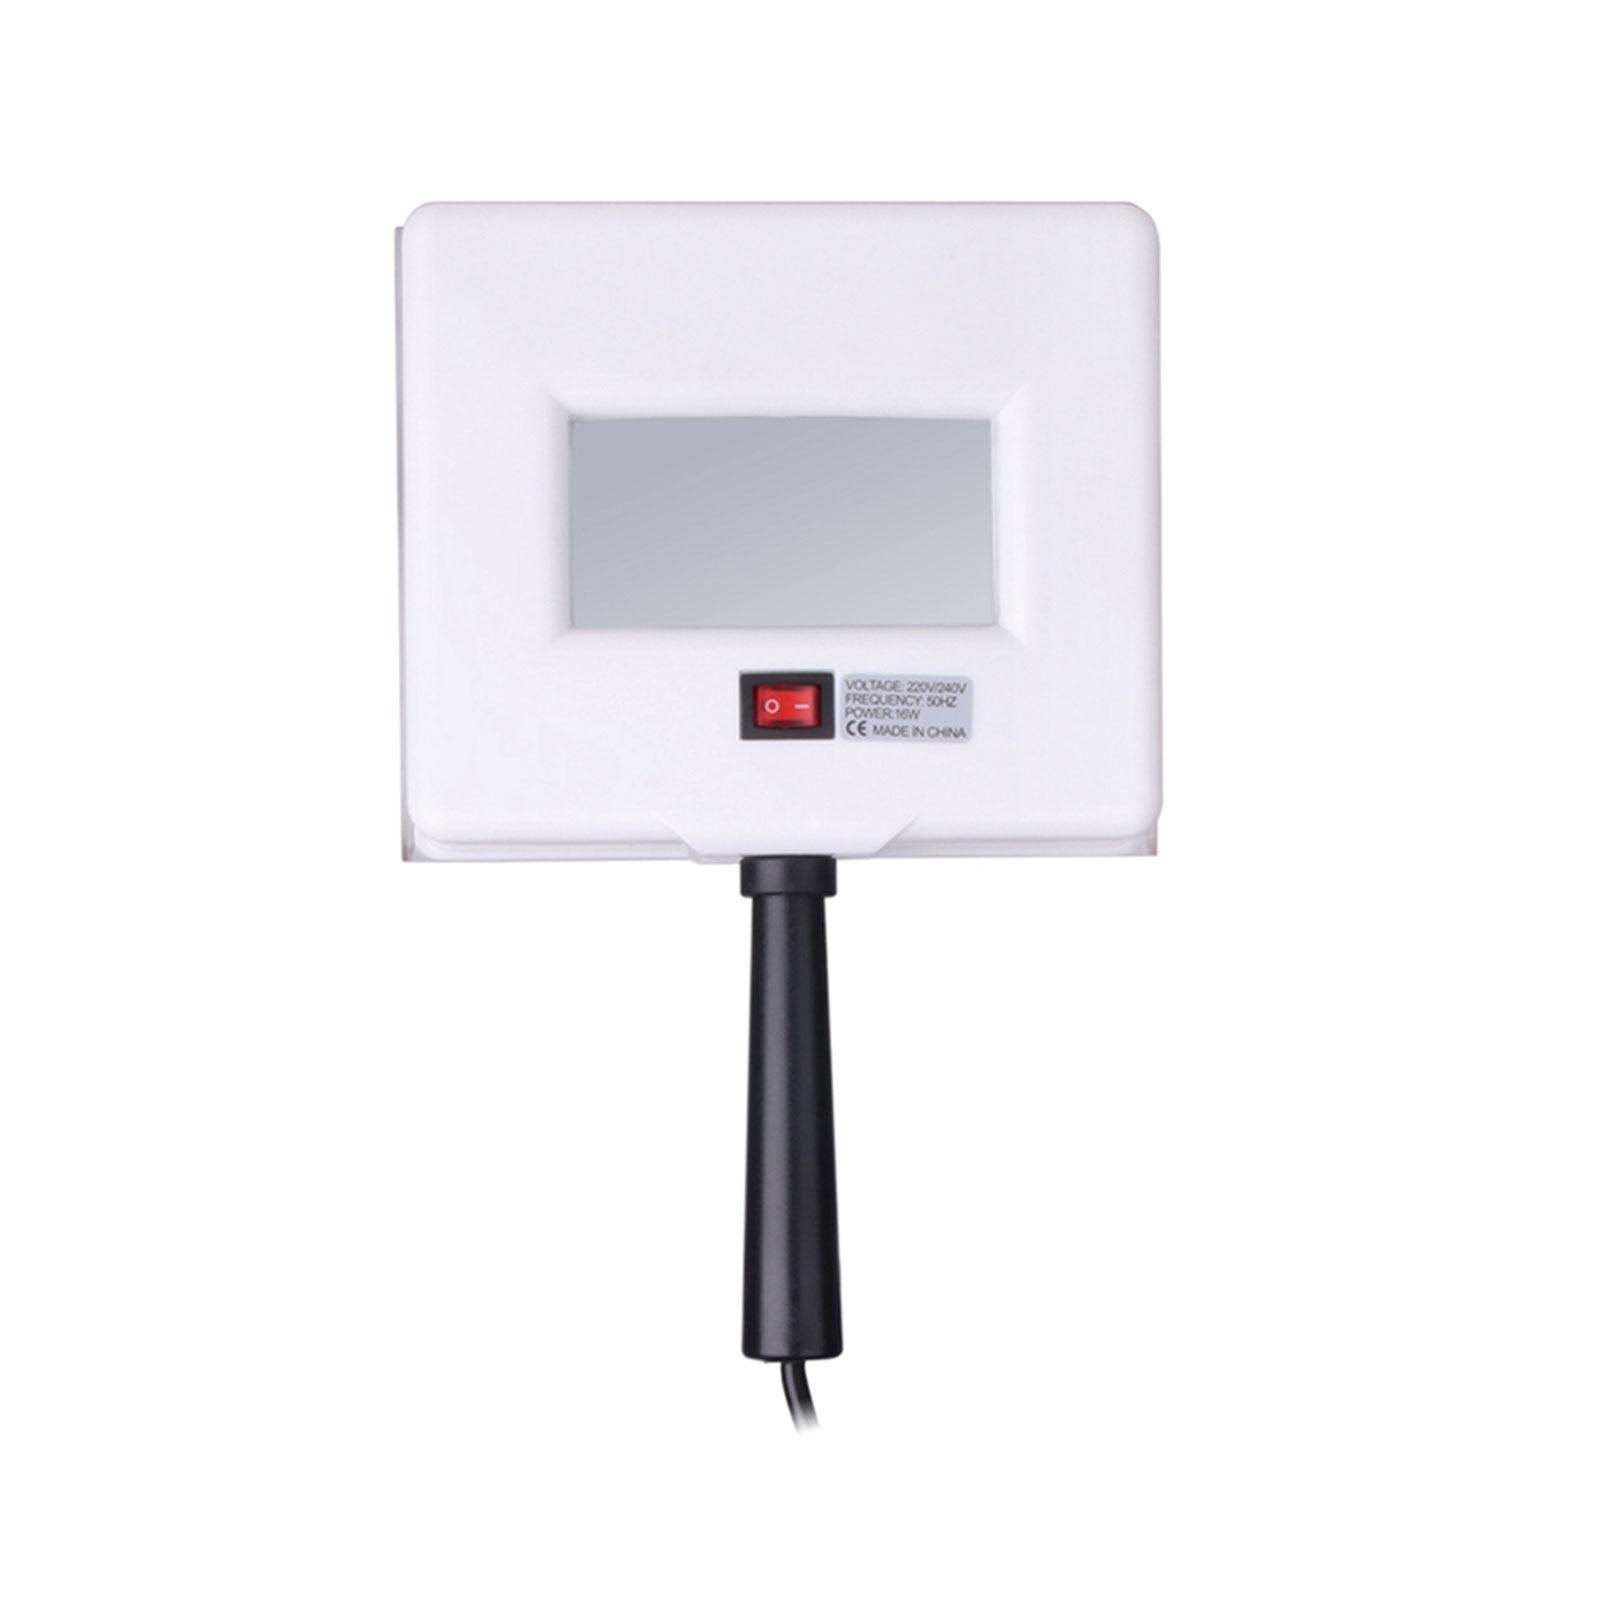 Lamp Facial Skin Testing Wood Lamp Skin UV Analyzer Examination Magnifying Analyzer Lamp Machine with Protective Cover Lamp SPA